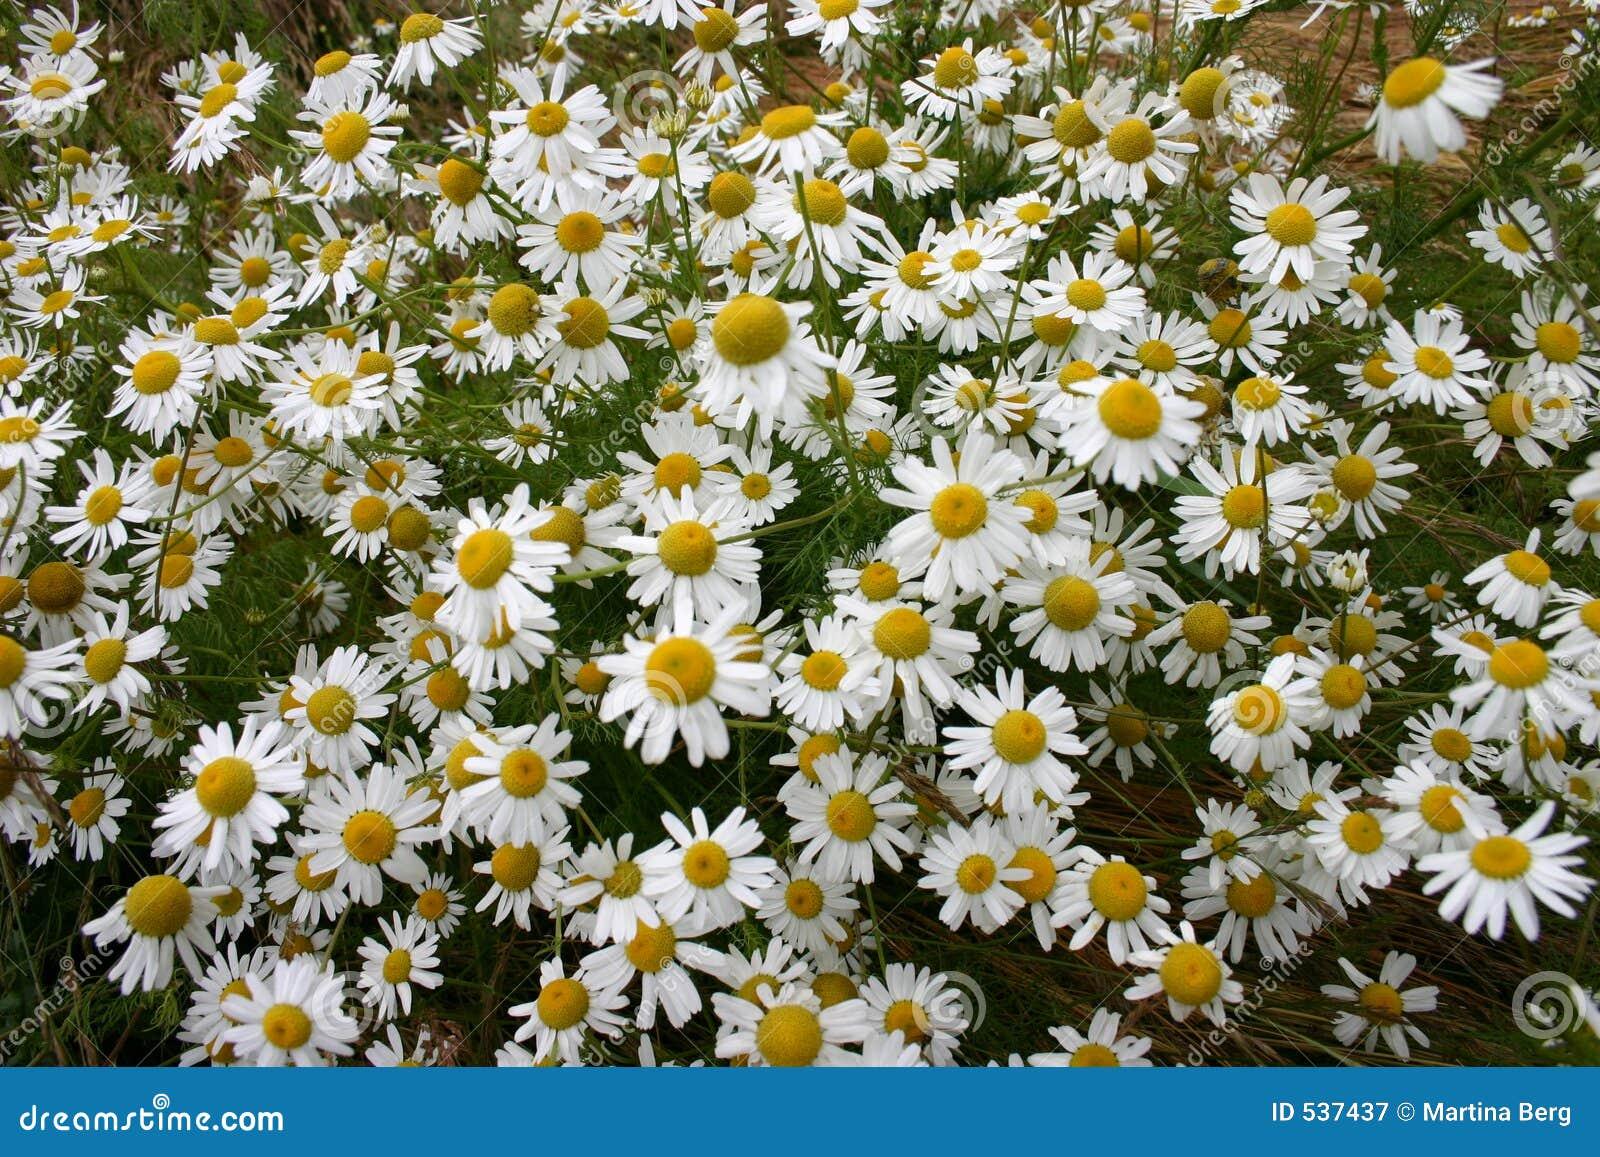 Download 春黄菊 库存图片. 图片 包括有  - 537437